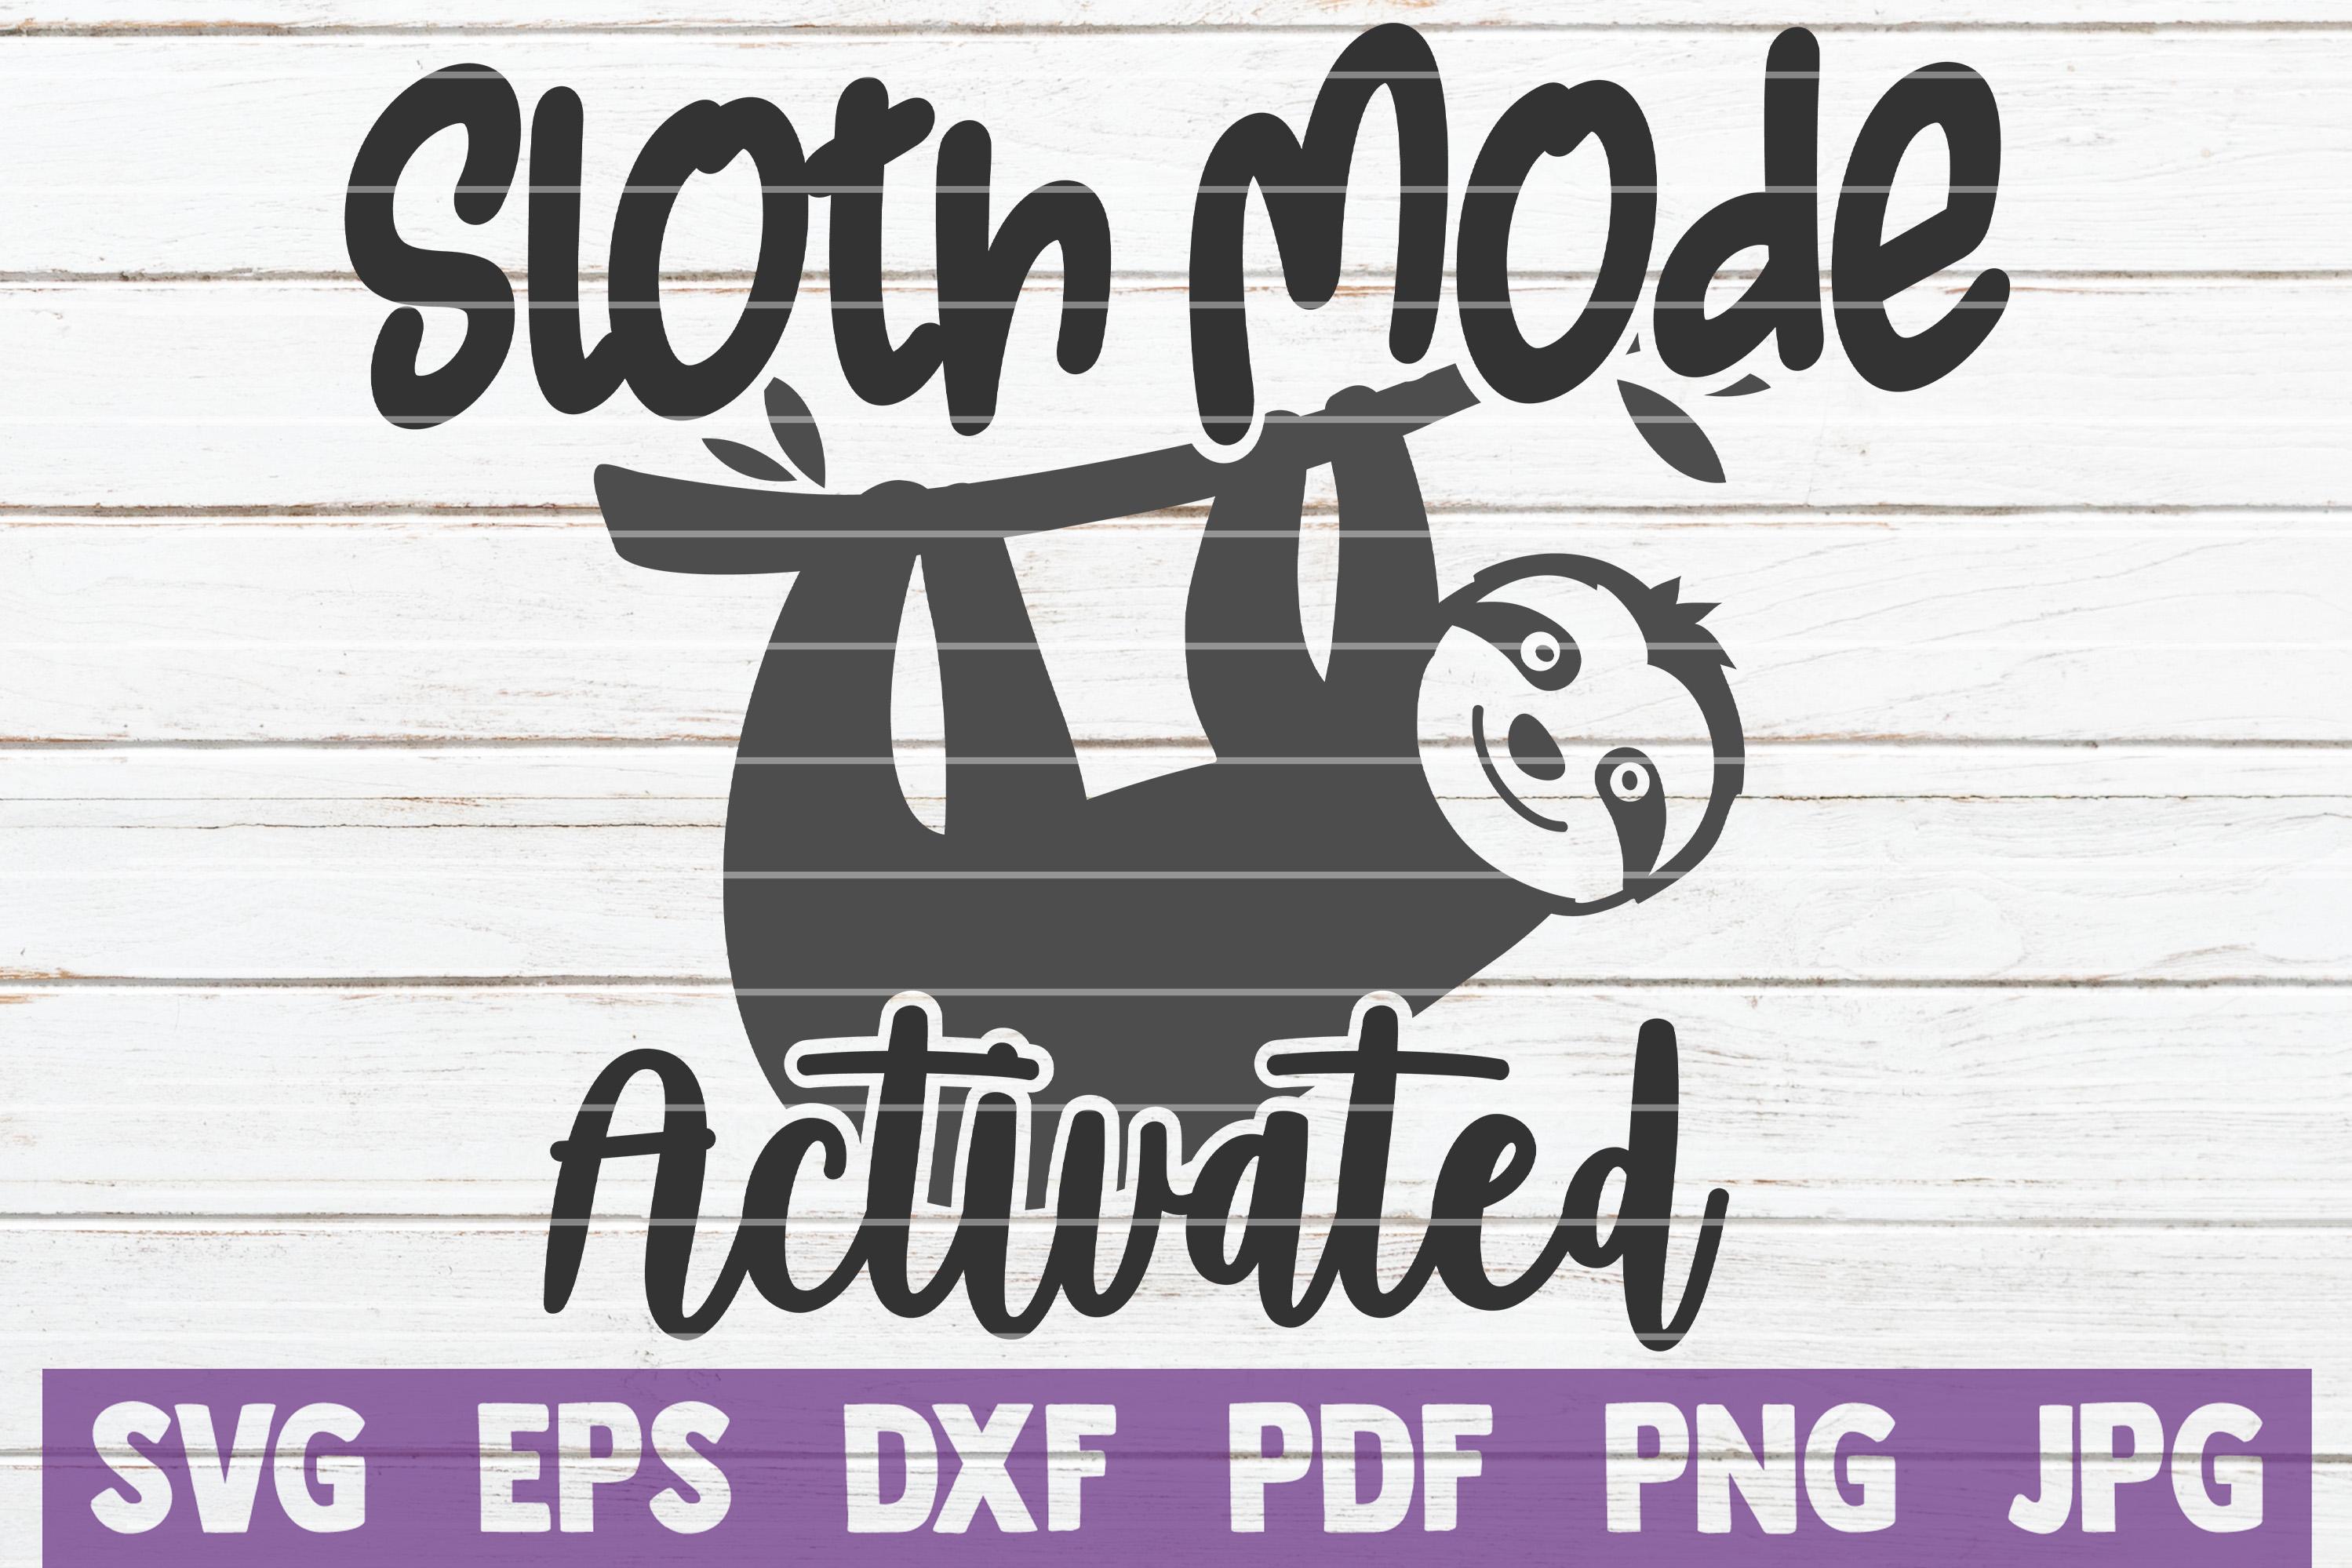 Sloth SVG Bundle | SVG Cut file | commercial use example image 7